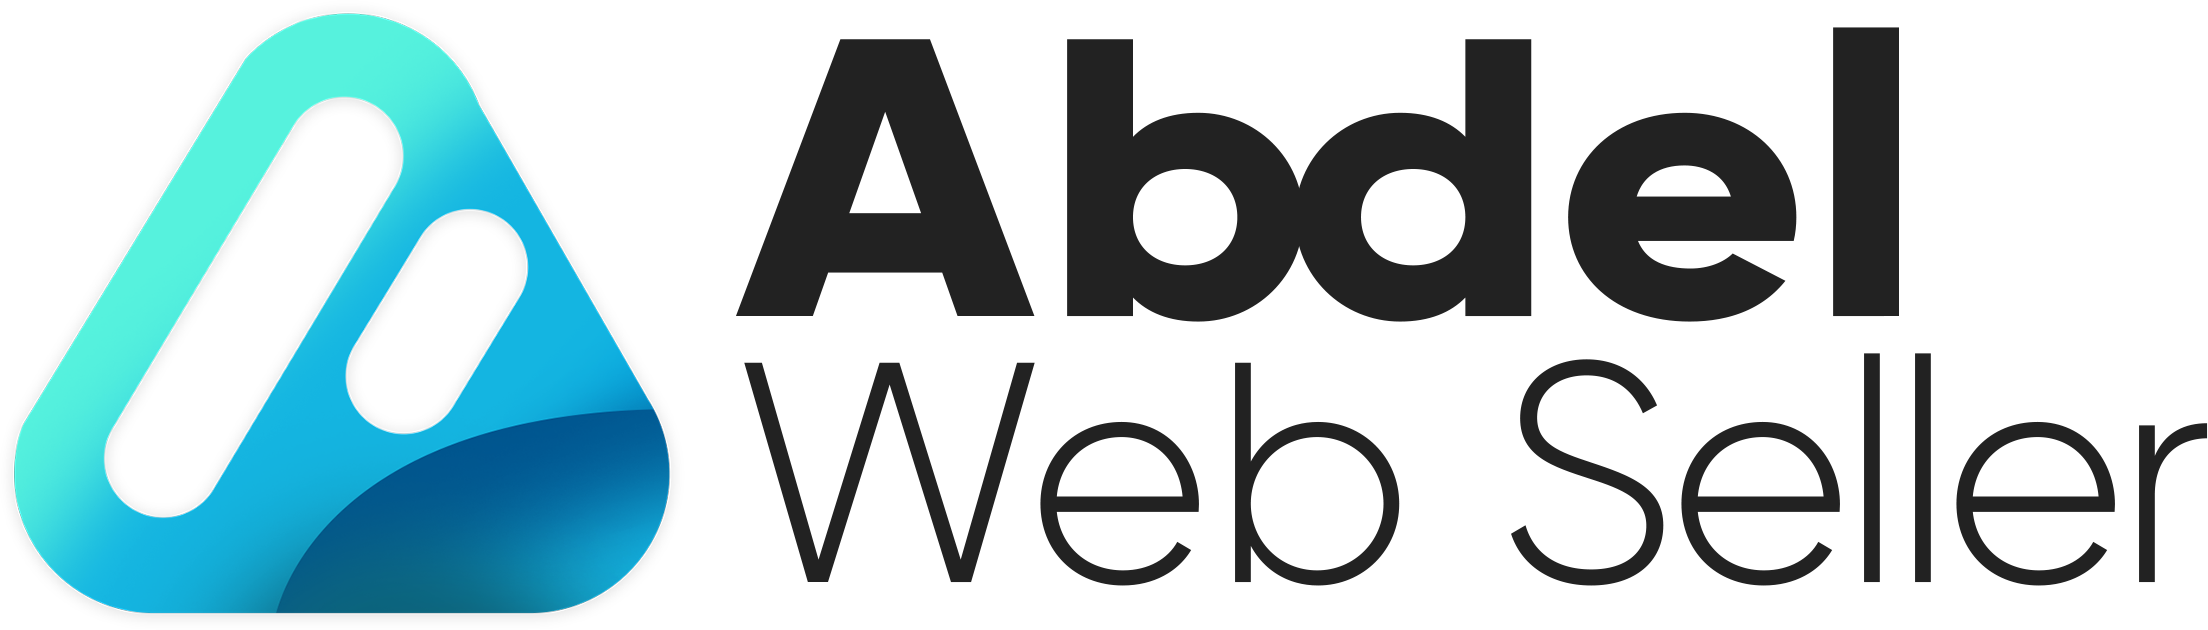 Abdel Web Seller-logo